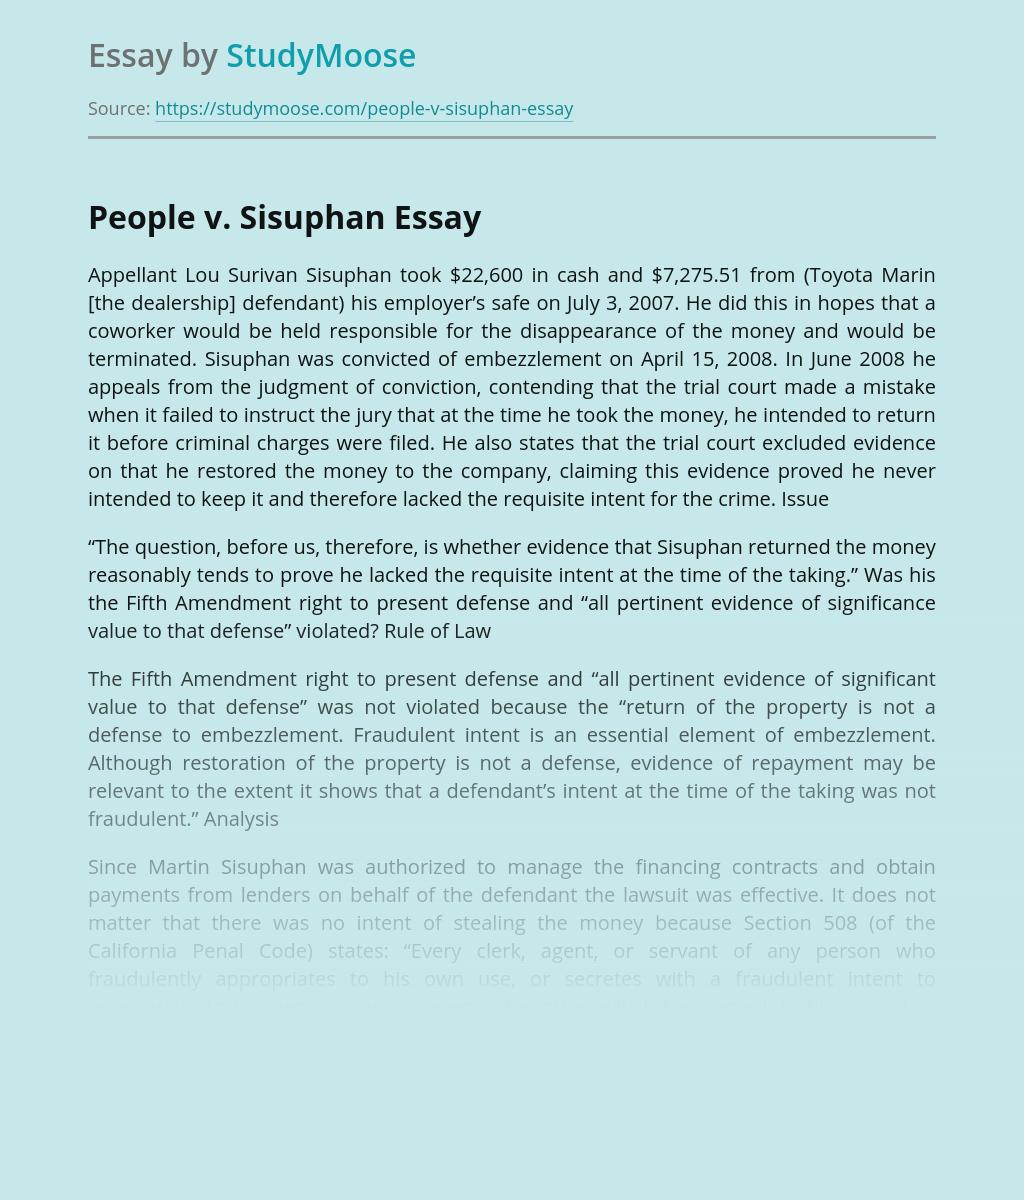 People v. Sisuphan